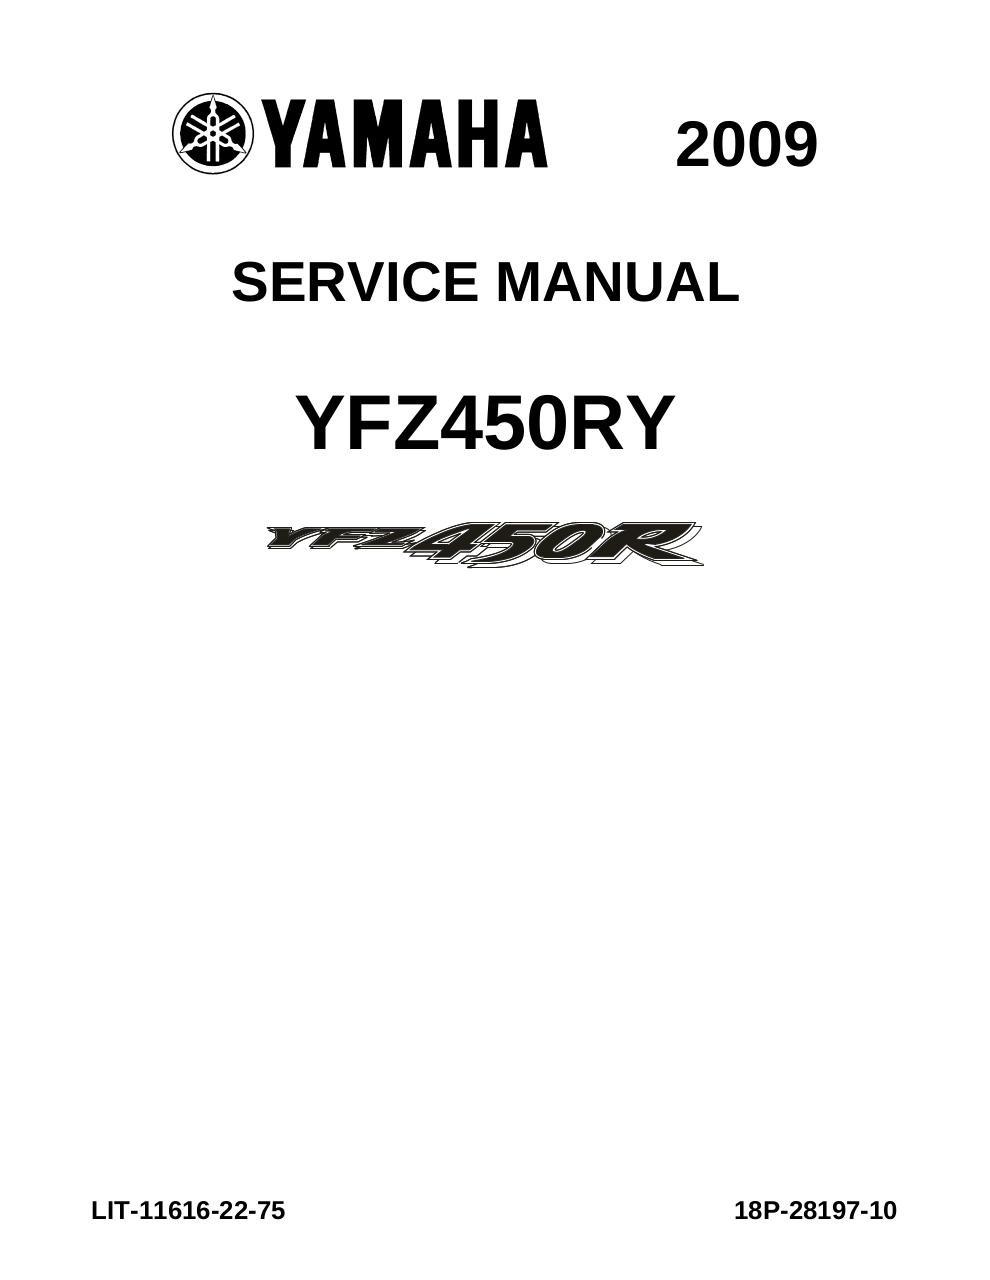 s18p10 yfz450r us print book par dtp5 02 yfz450r service manual 1 rh fichier pdf fr 2009 YFZ450R with Red Frame Yamaha YFZ450R